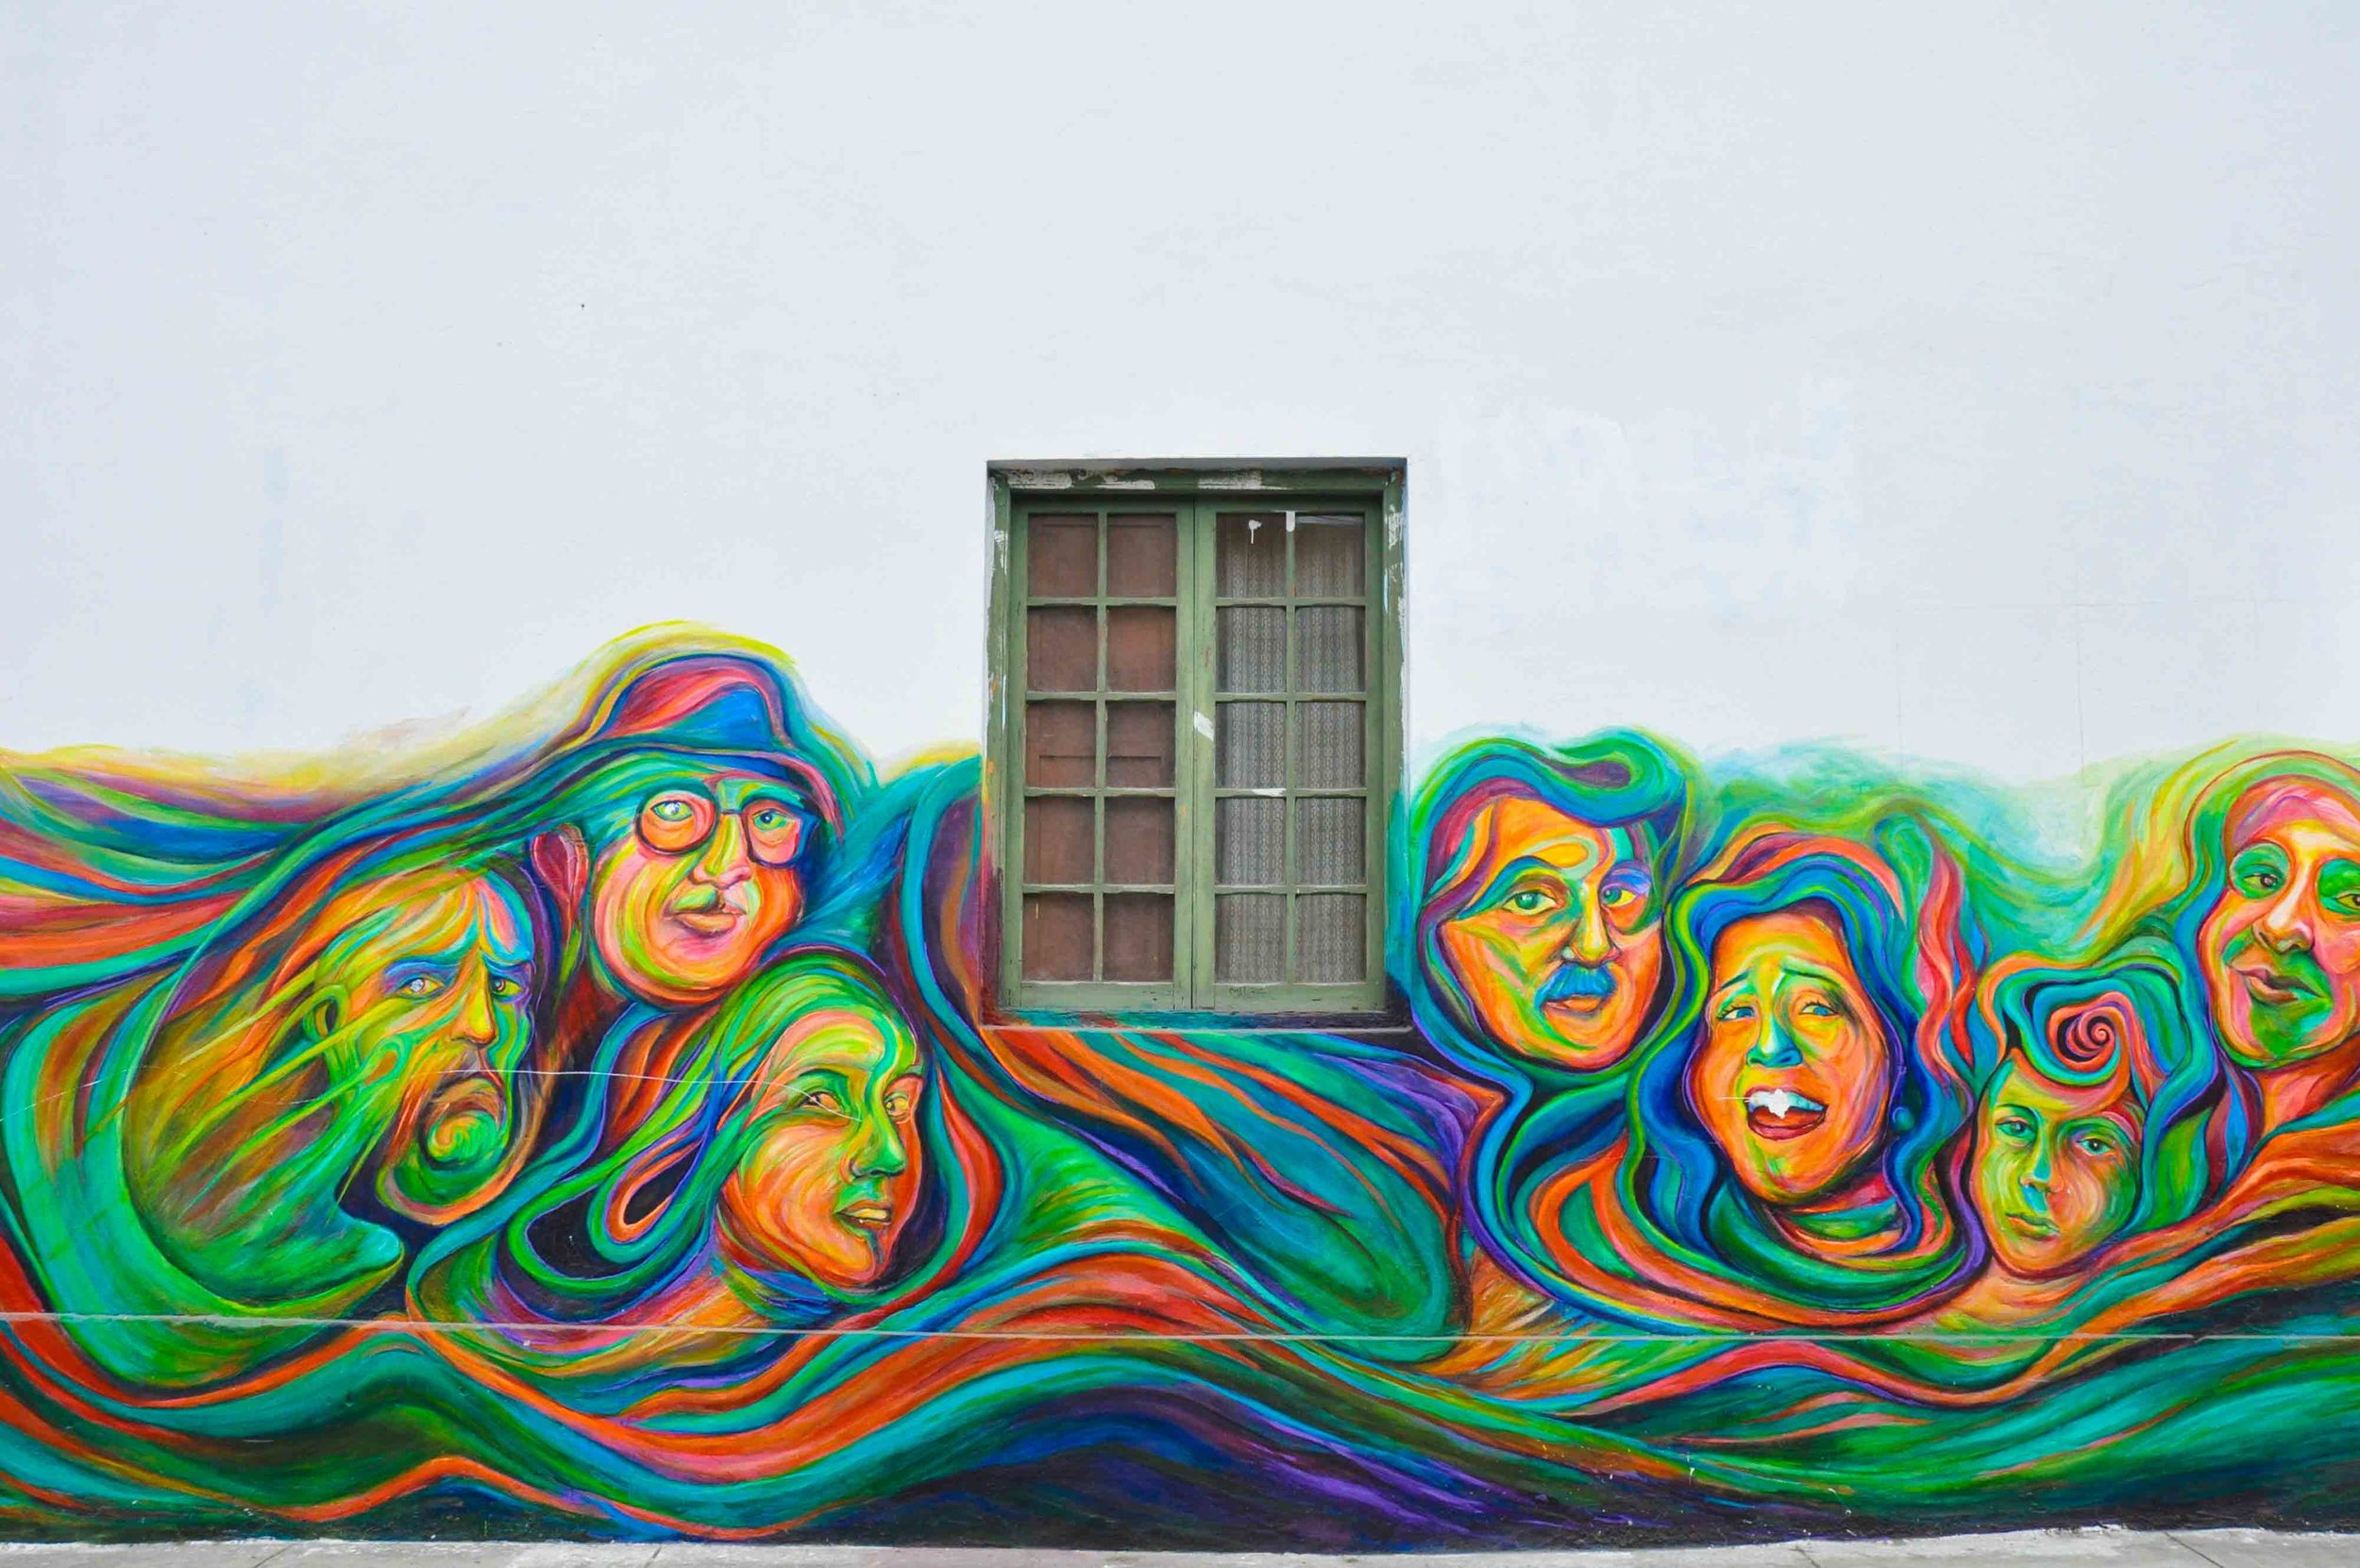 2015_11_S_LimaParacasHuacachina-64.jpg